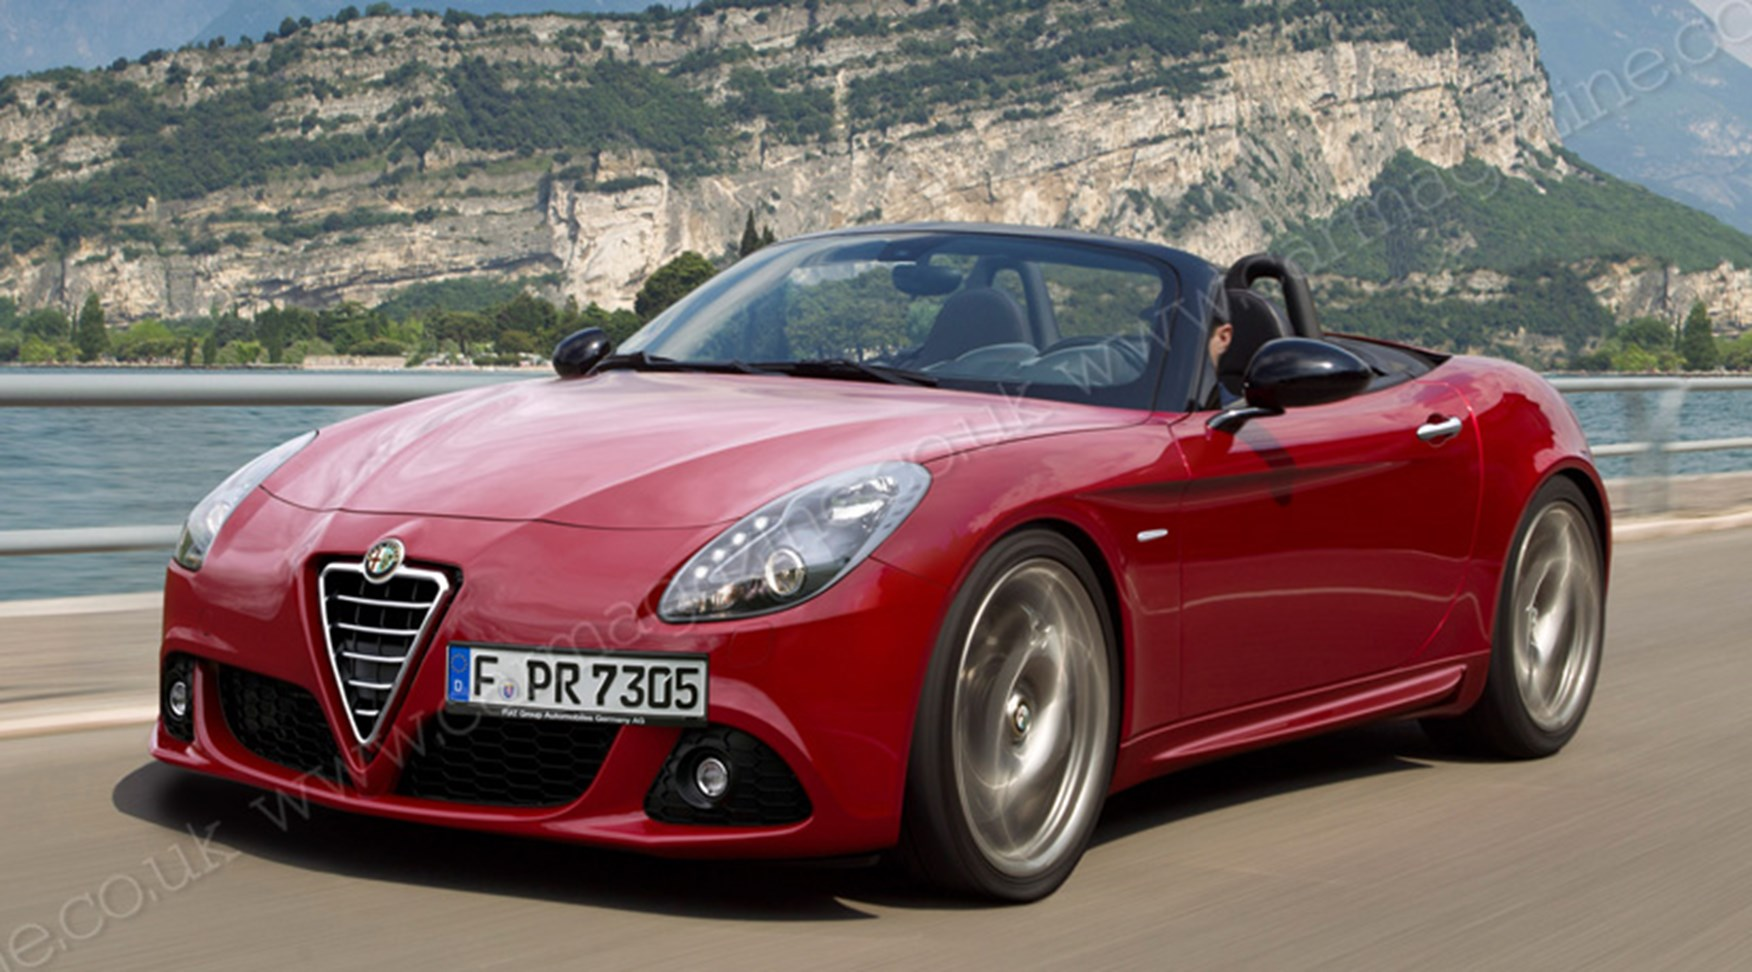 2018 Alfa Romeo Giulia Parts and Accessories Automotive